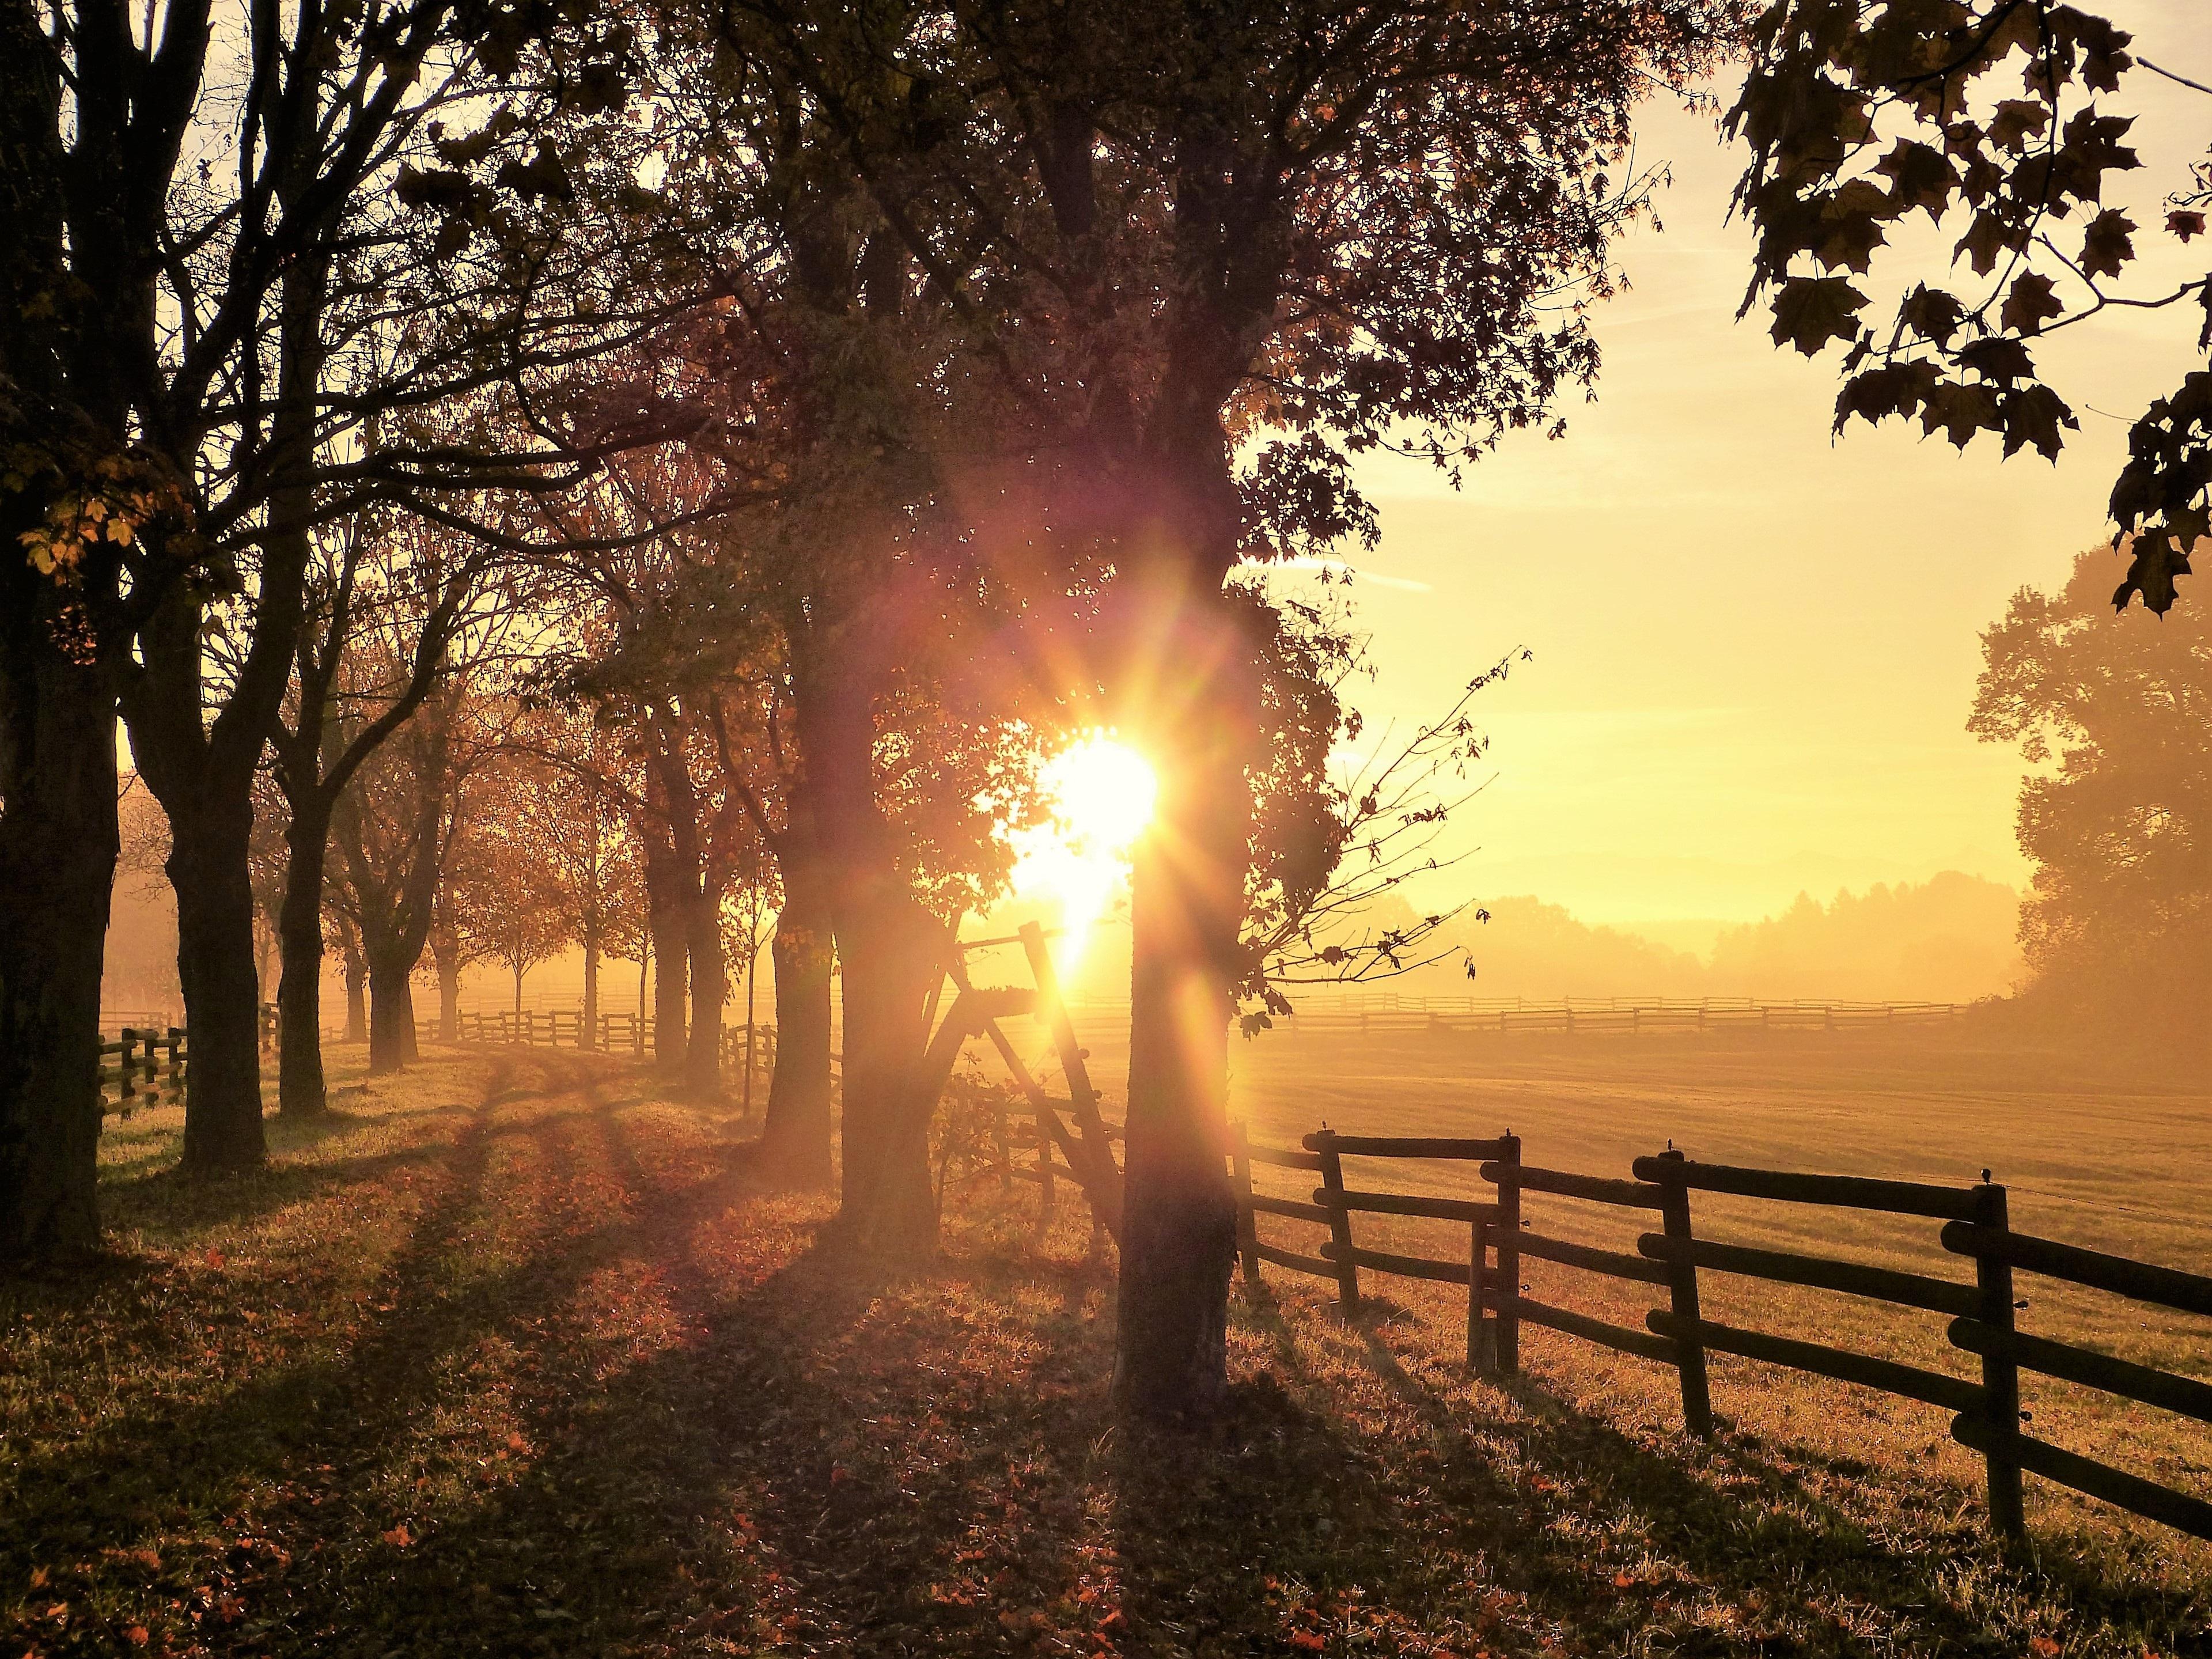 sun fog sunrise trees - photo #34